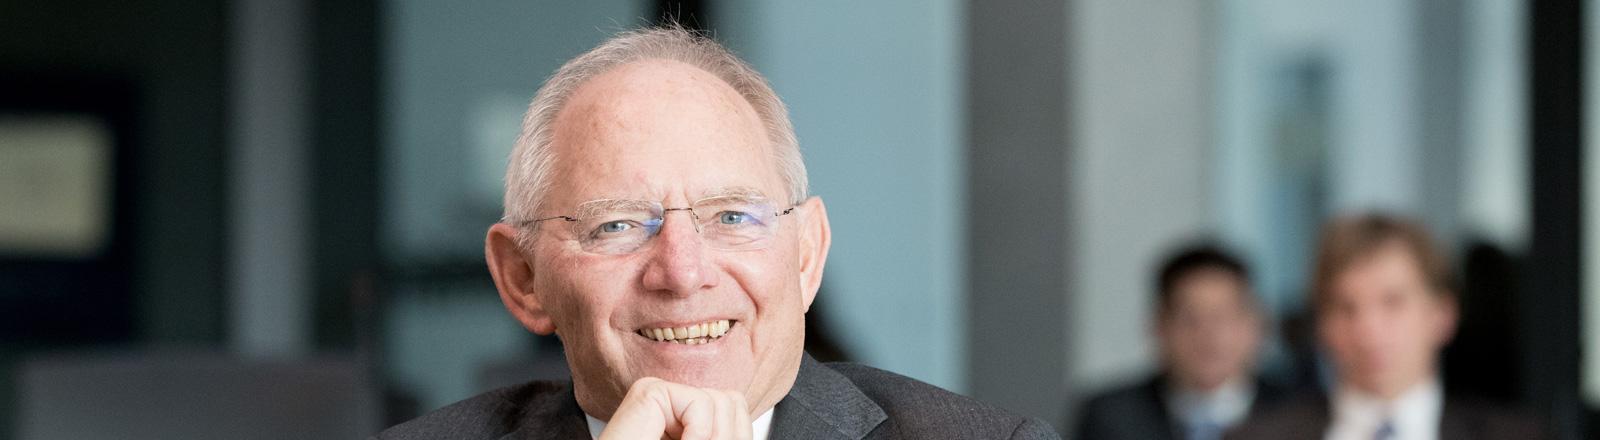 Bundesfinanzminister Wolfgang Schäuble lacht